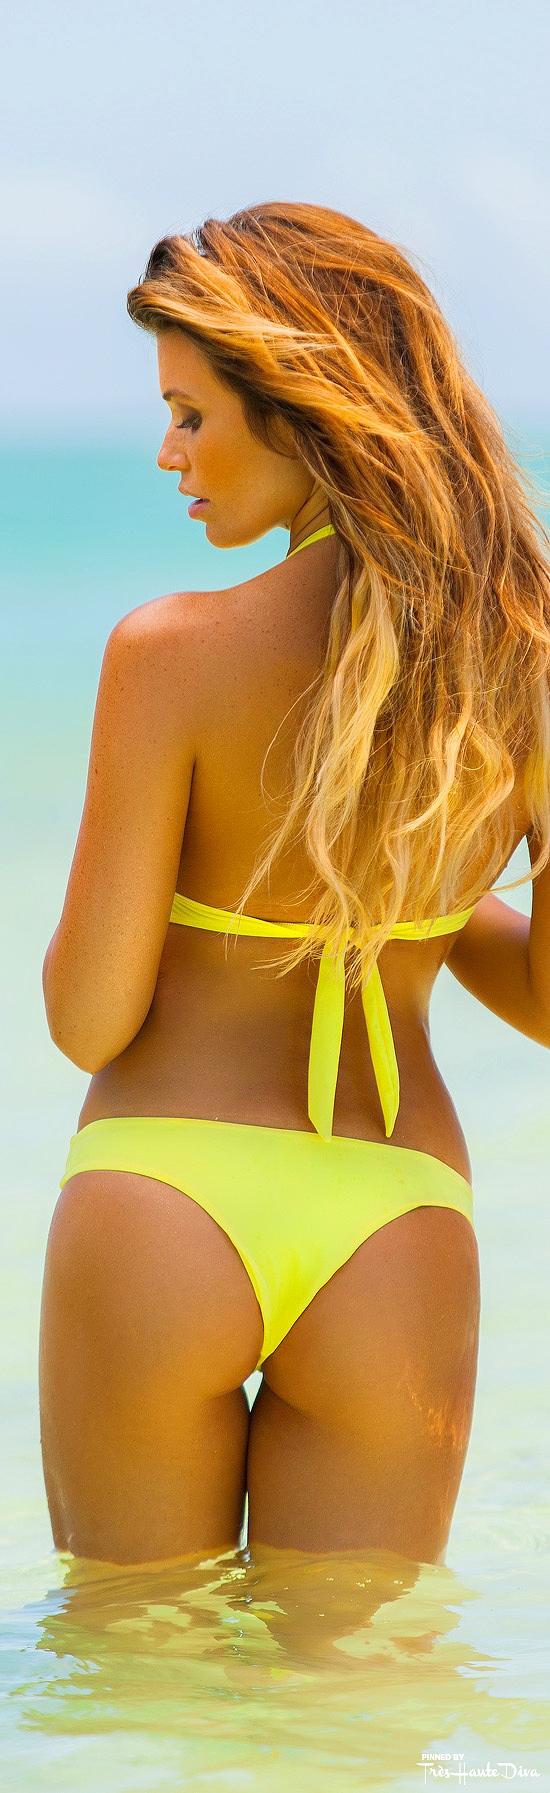 Plumeria Swimwear Samantha Hoopes